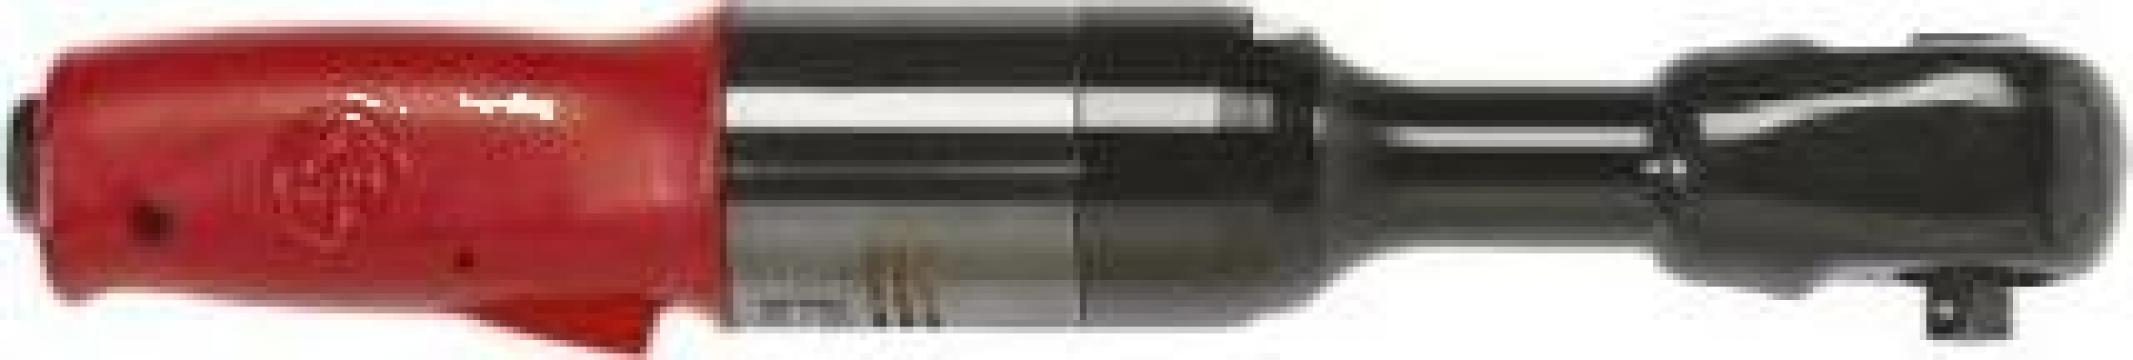 Cheie cu clichet pneumatica Chicago Pneumatic CP9431Q de la Nascom Invest